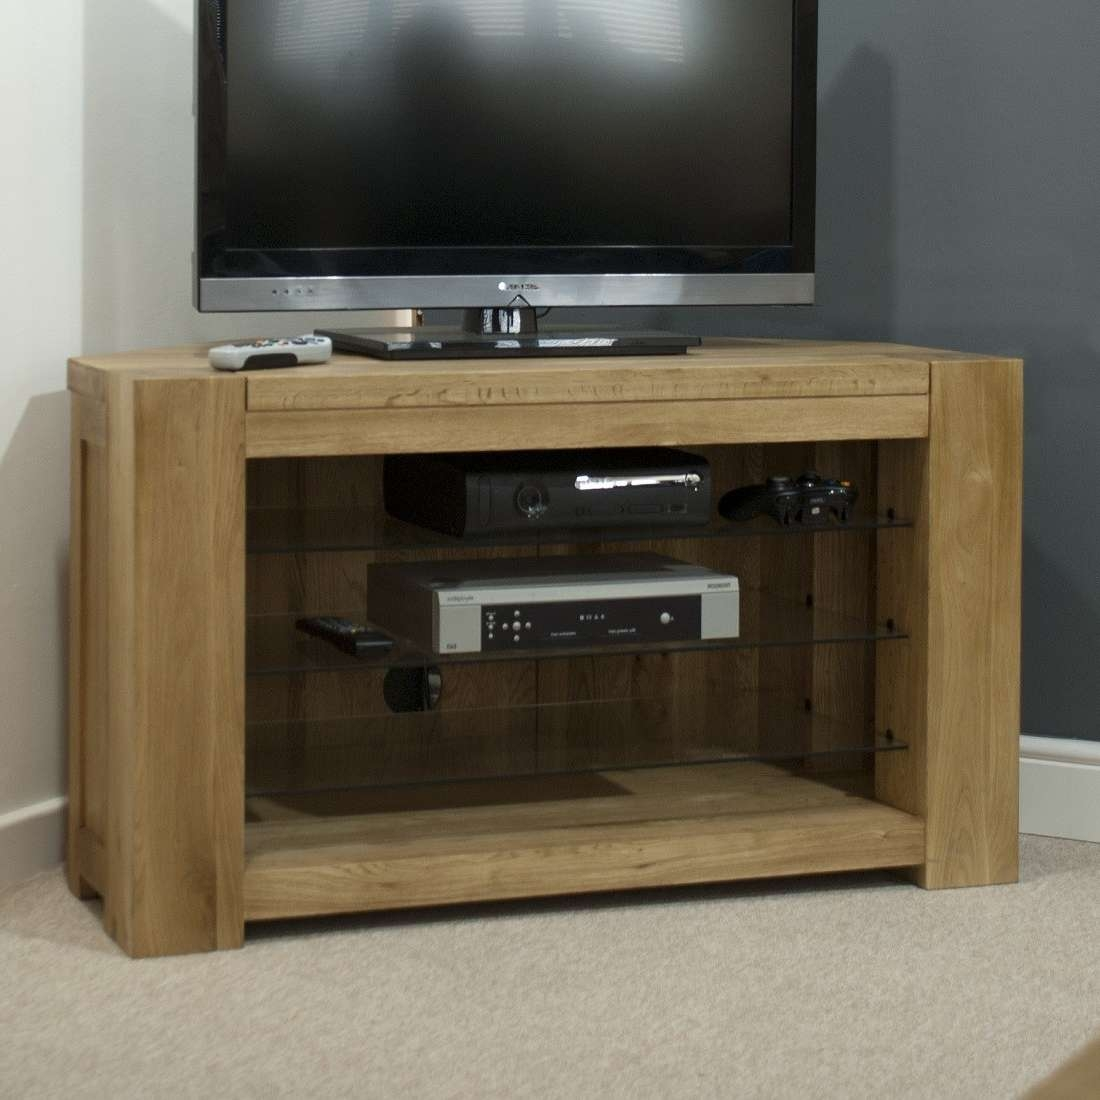 Trend Solid Oak Corner Tv Unit   Oak Furniture Uk Throughout Real Wood Corner Tv Stands (View 9 of 15)